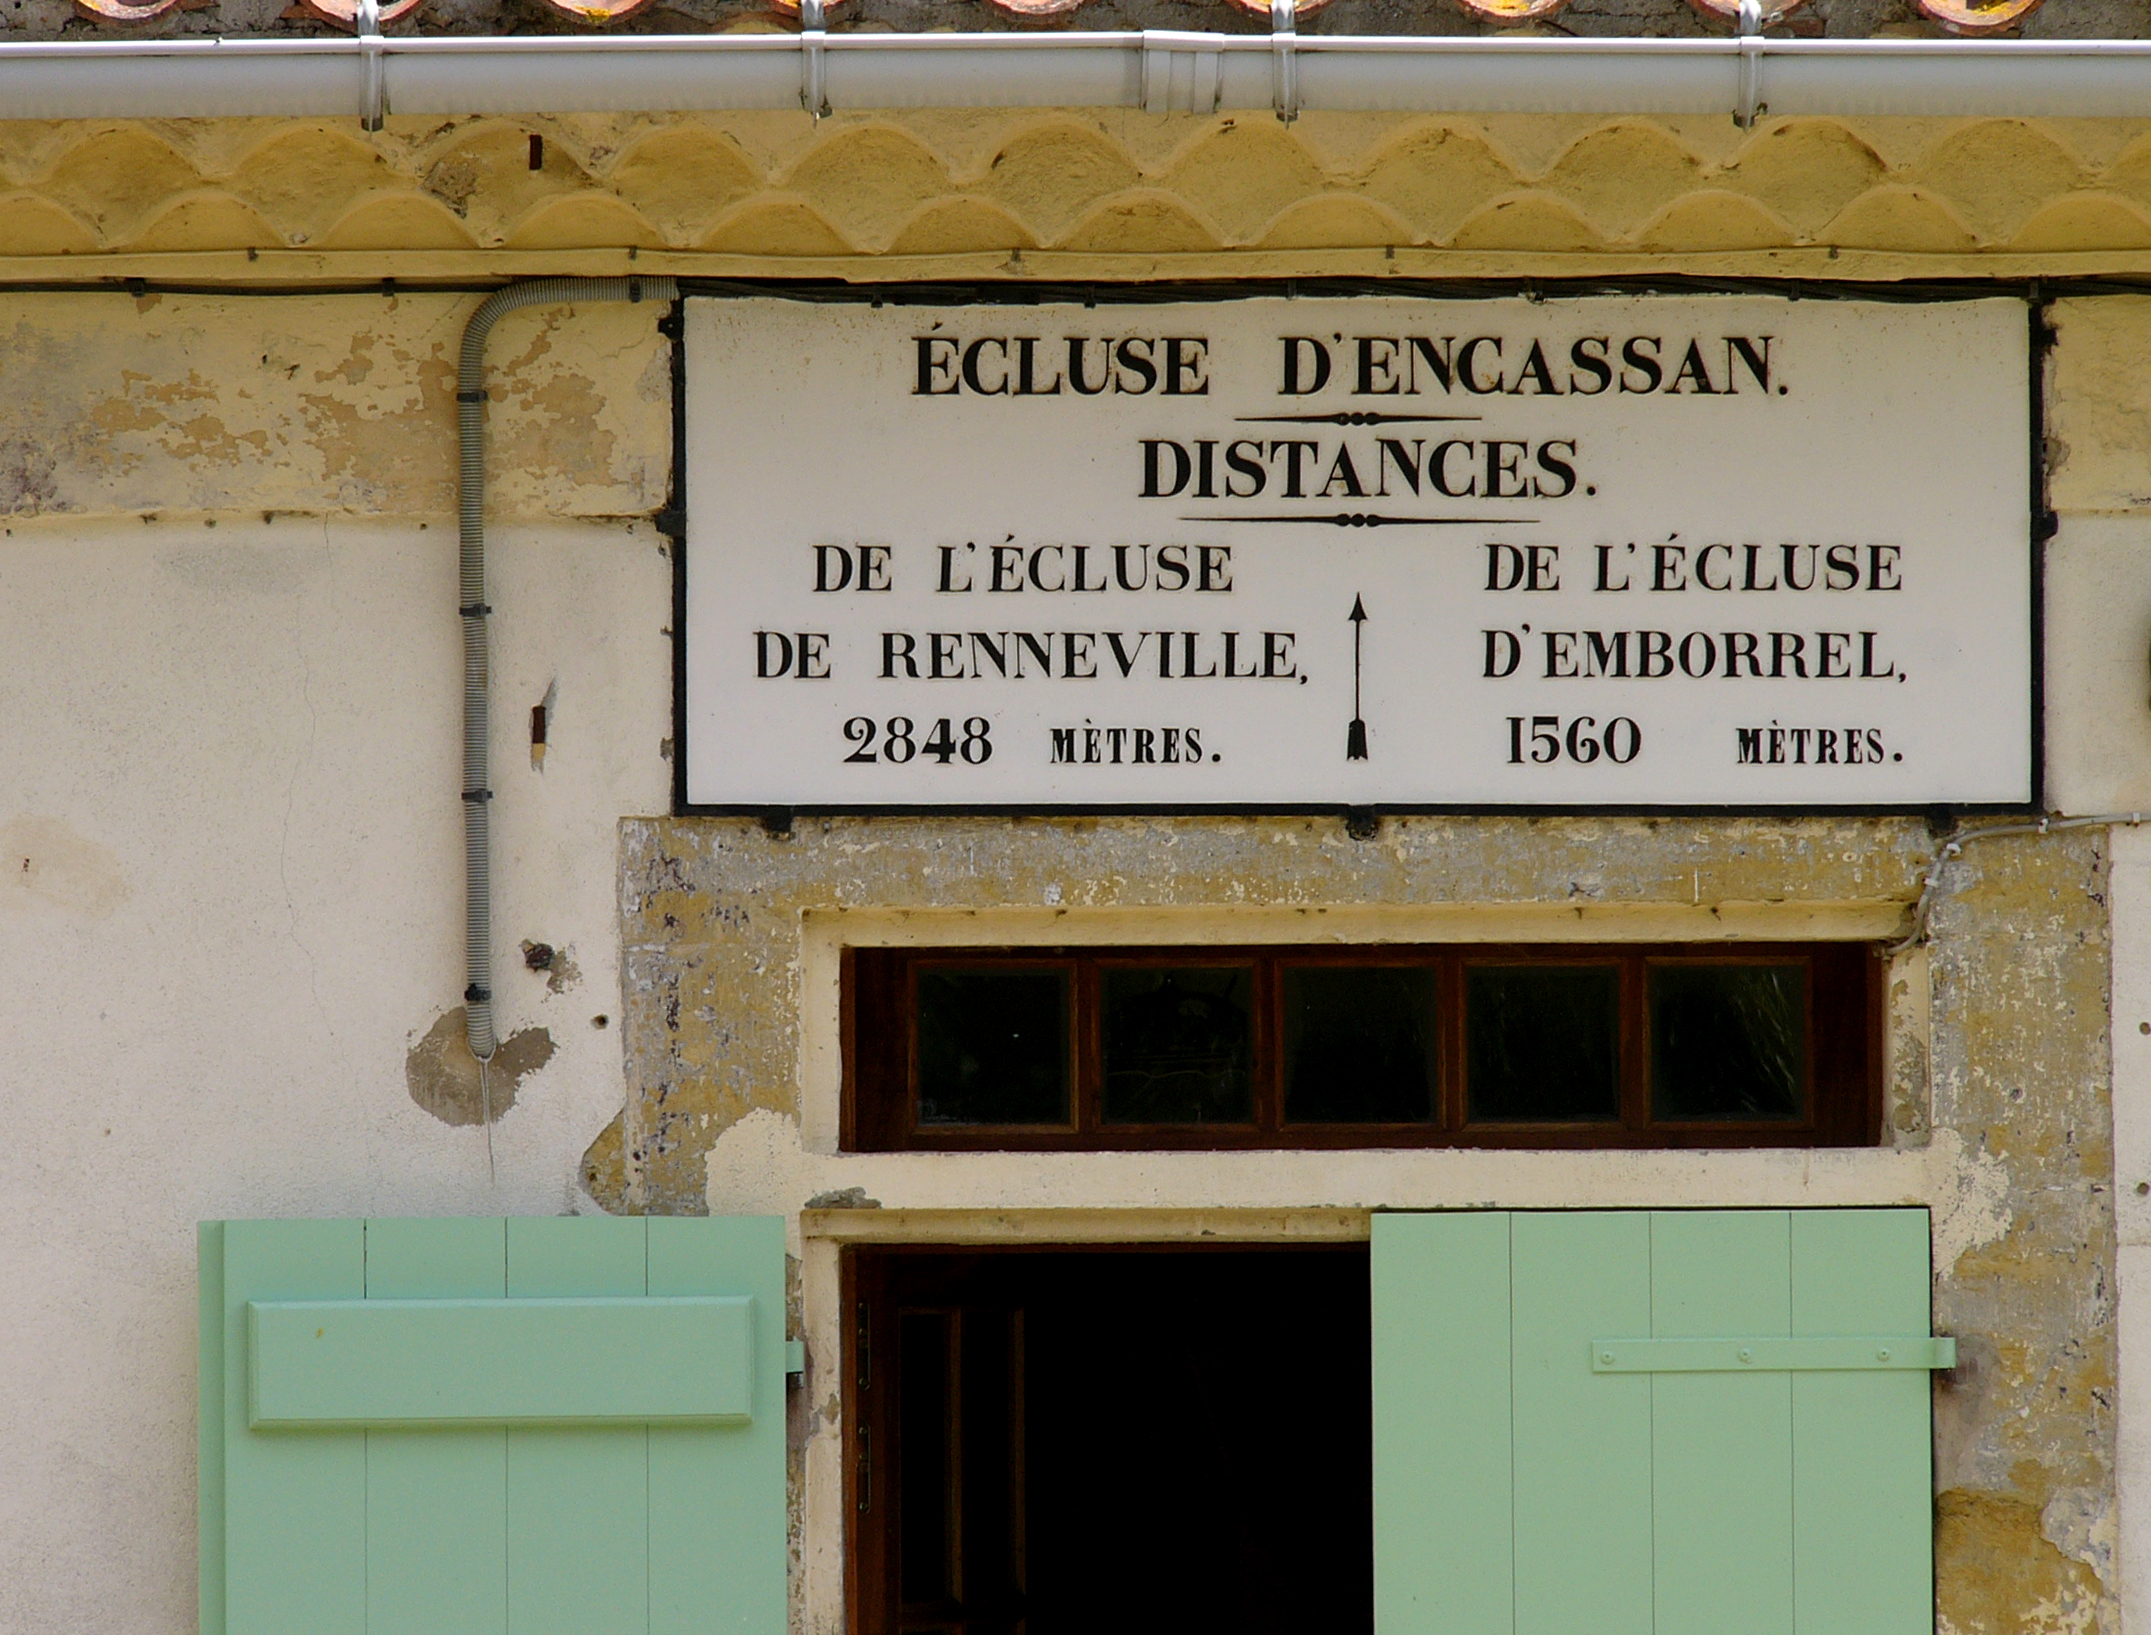 Encassan Lock - Canal du Midi.jpg